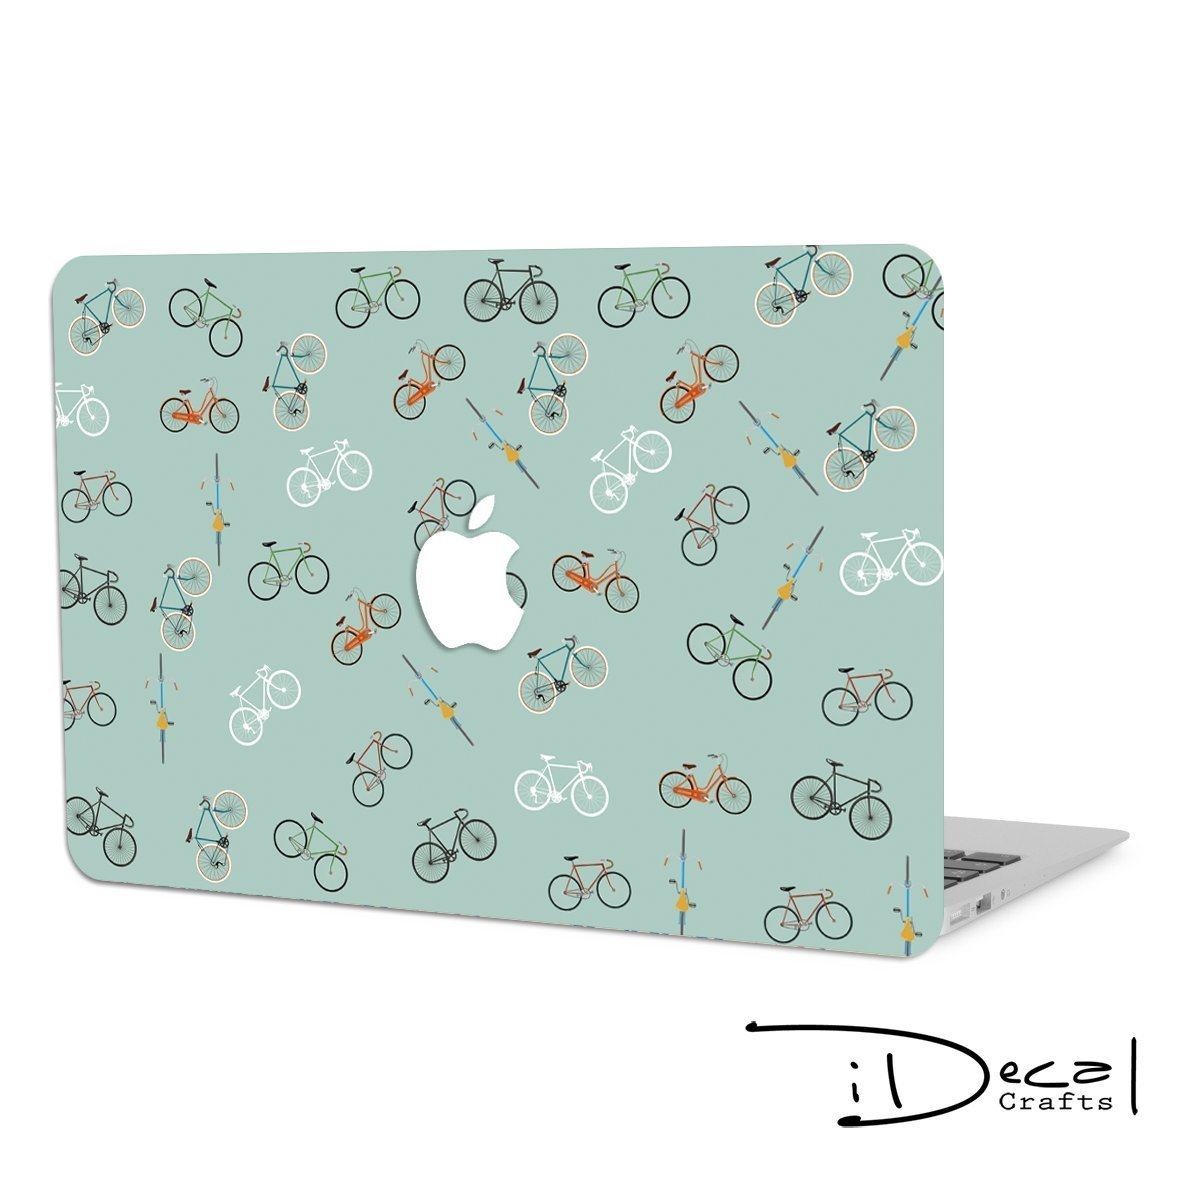 Bicycle Macbook Skin Macbook Sticker Macbook Decal Macbook Air Skin Macbook Pro Skin Macbook Air Sticker Macbook Pro Sticker